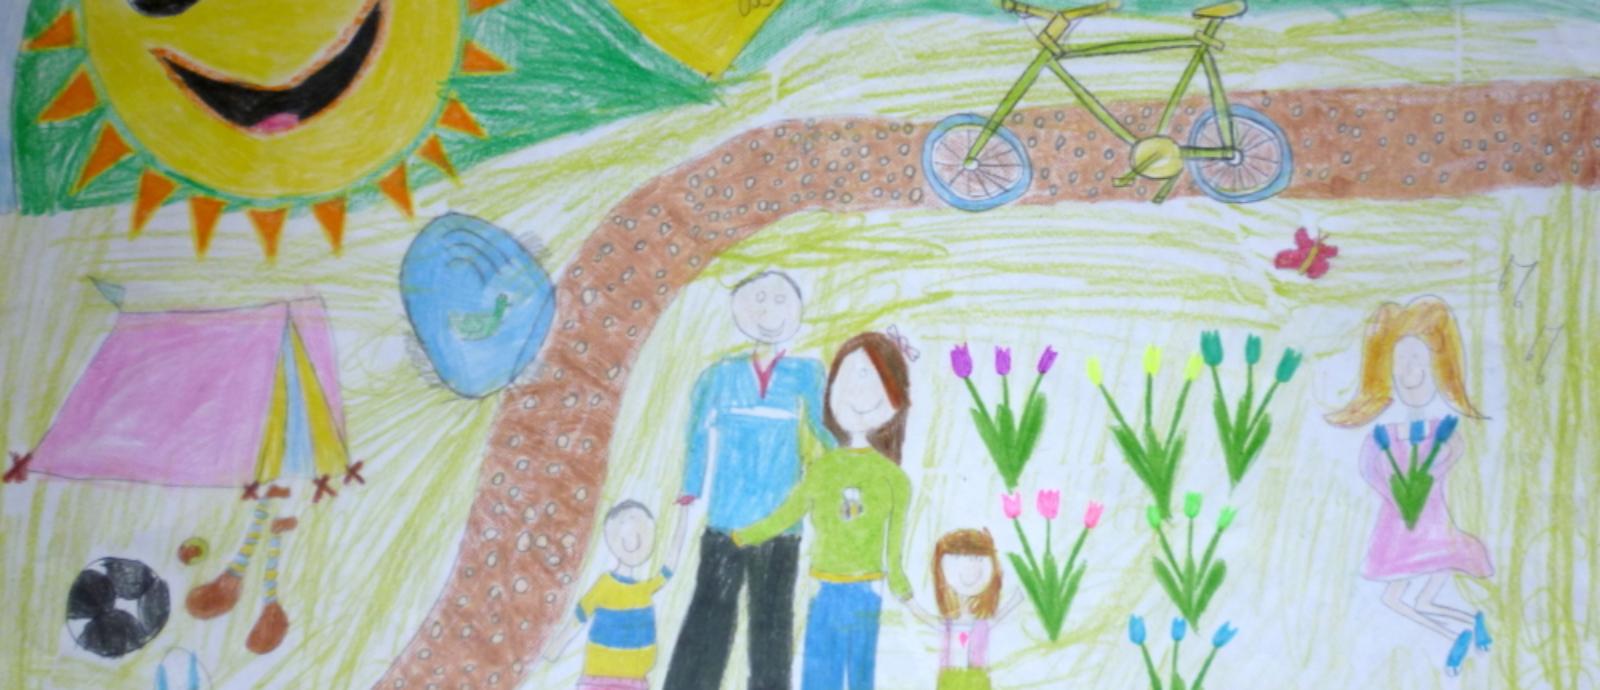 glór presents Lockdown through a young Lens: County Clare Kids Art Exhibition